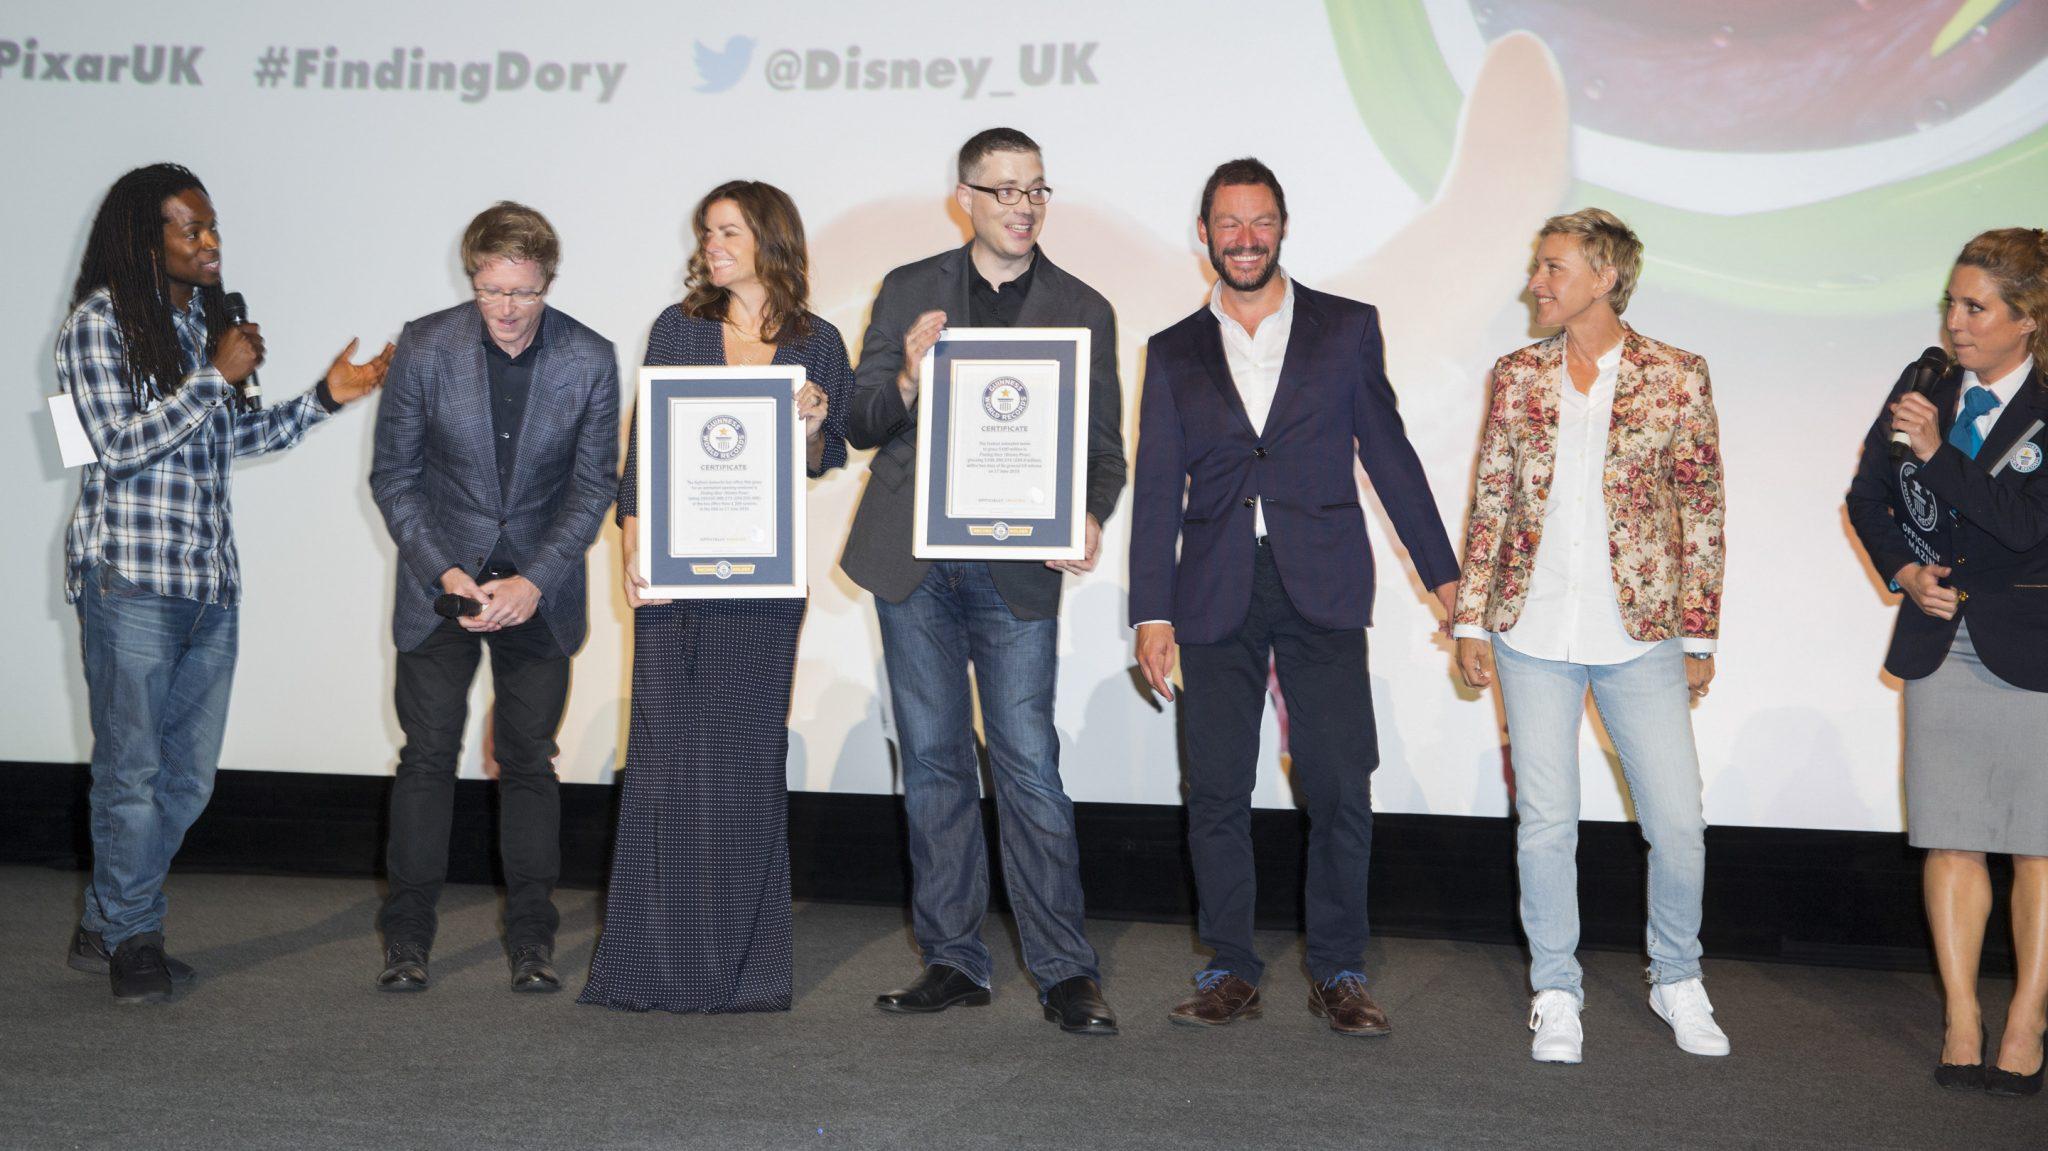 Nigel Clarke, Andrew Stanton, Dominic West, and Ellen DeGeneres at the Finding Dory UK Premiere (Close Up)